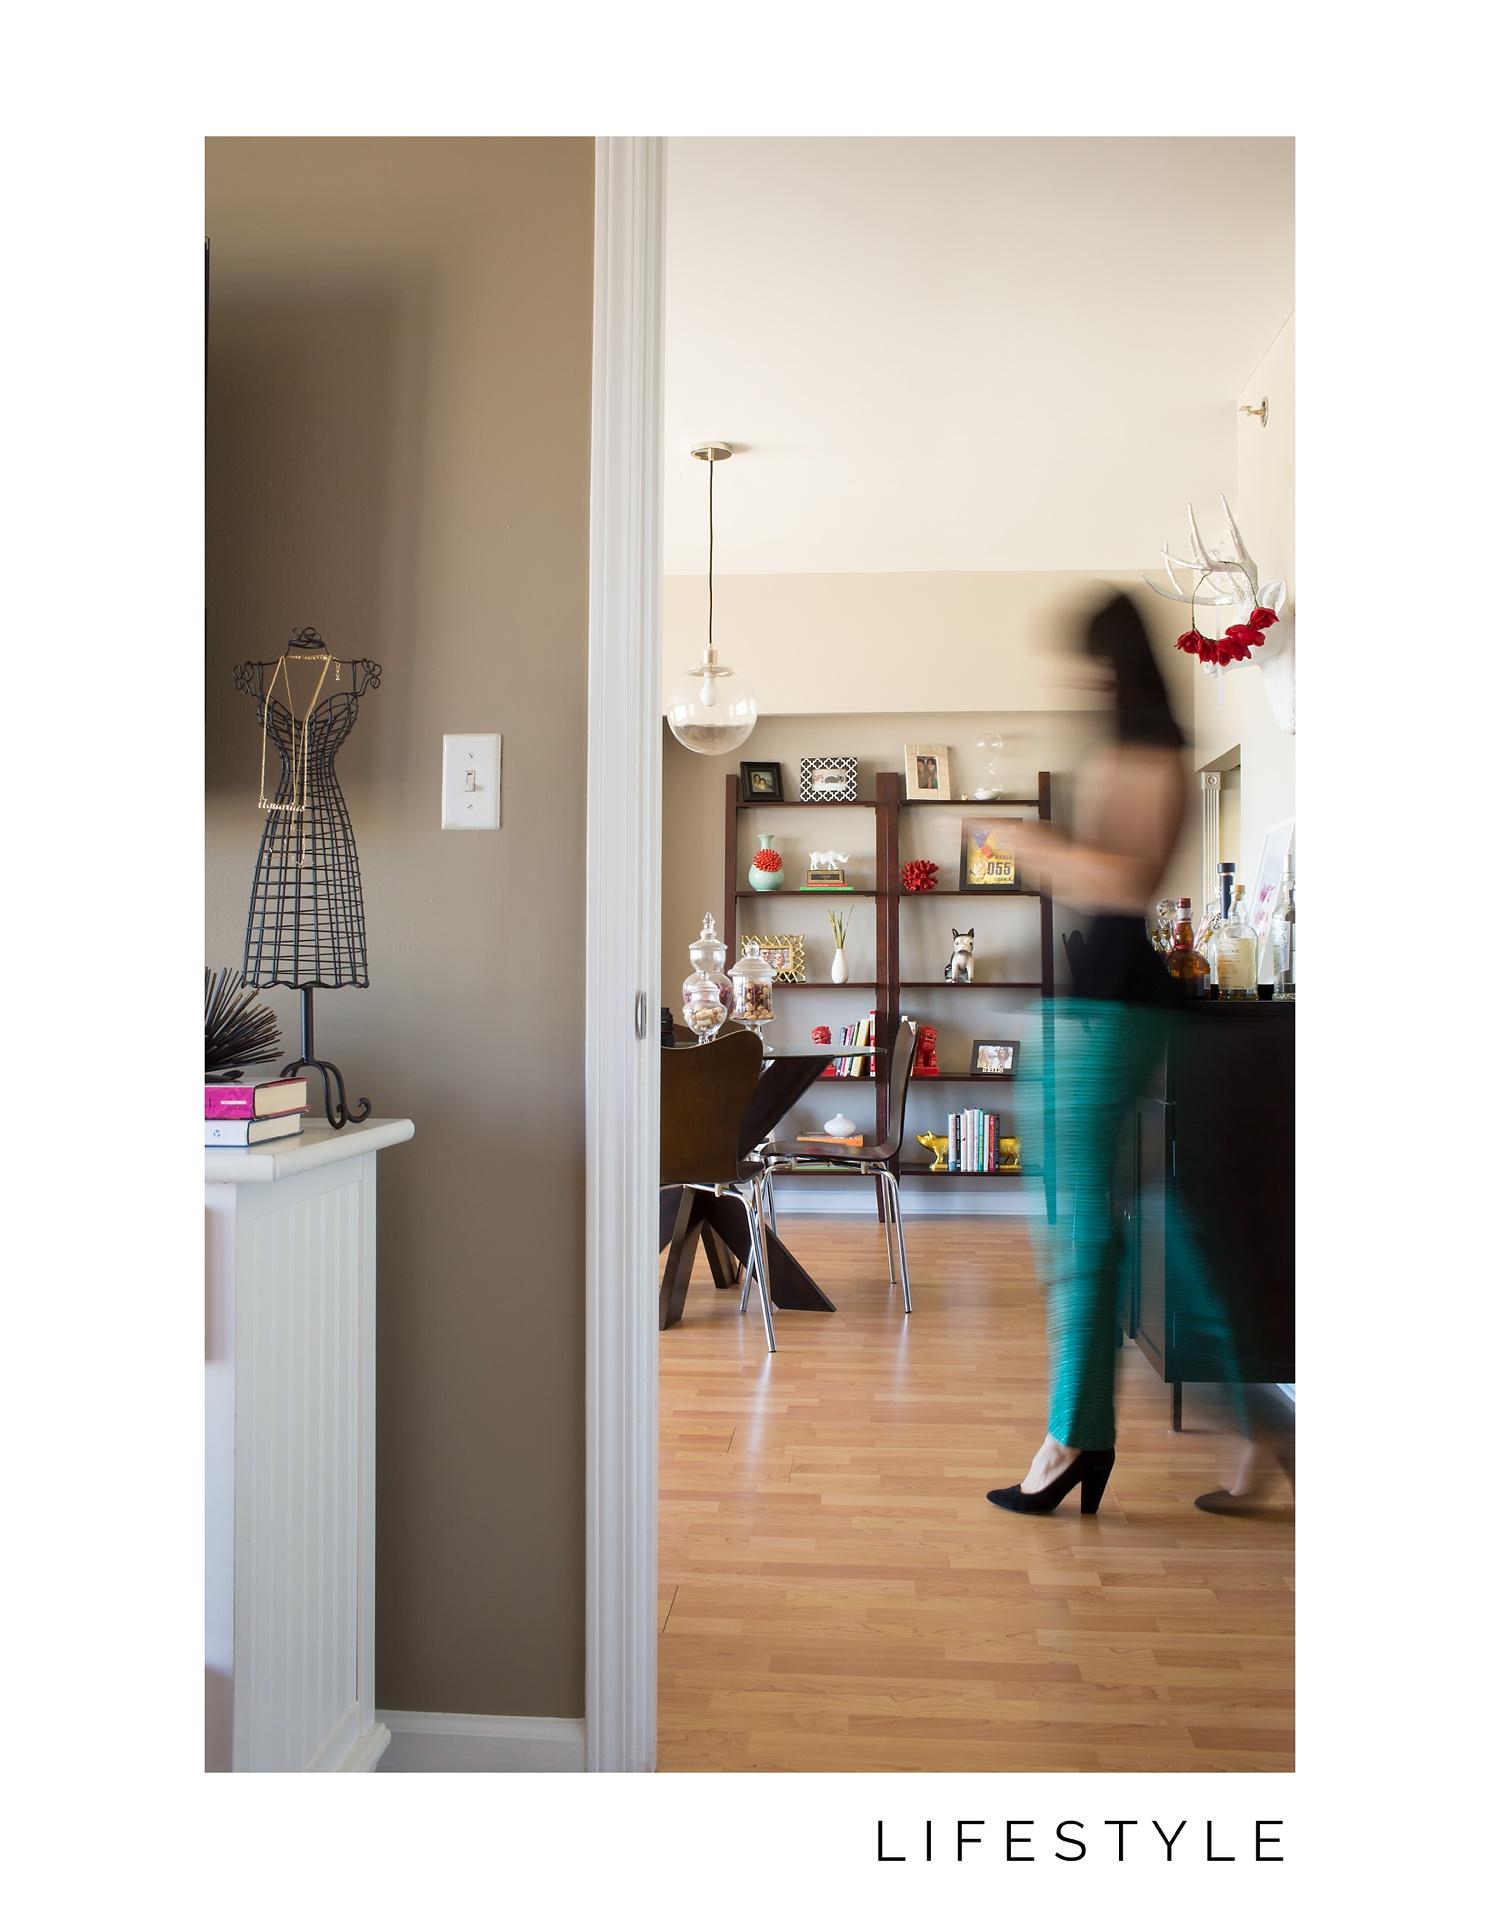 Atlanta interiors photographer in My Style Vita's home